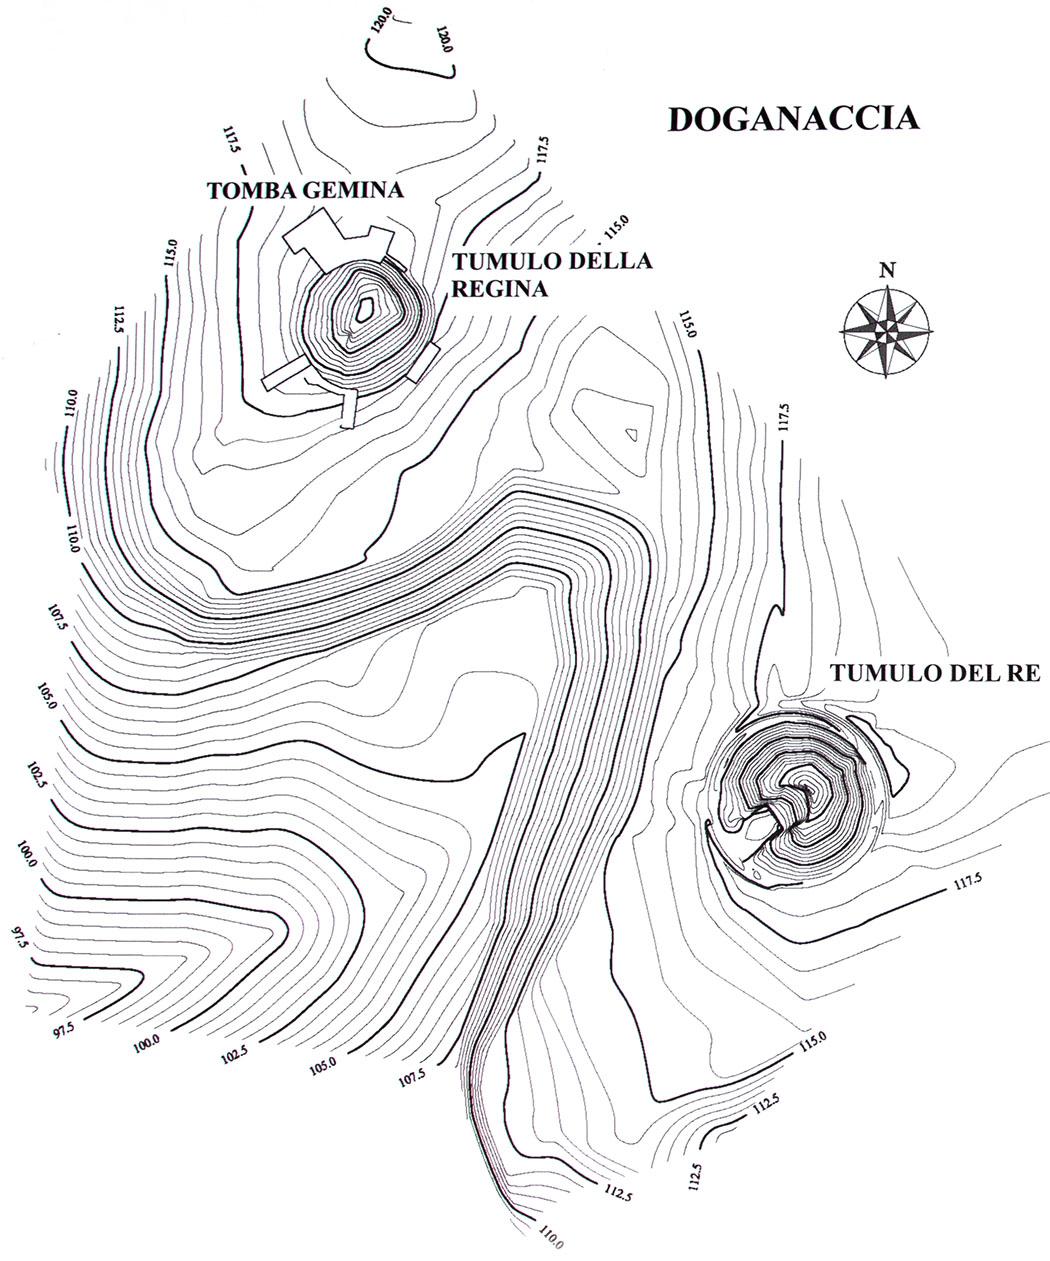 tarquinia, map, doganaccia - Die Karte zeigt die Lage der Grabhügel der Doganaccia-Nekropole von Tarquinia: Tomba Gemina, Tumuli della Regina und Tumuli del Re.